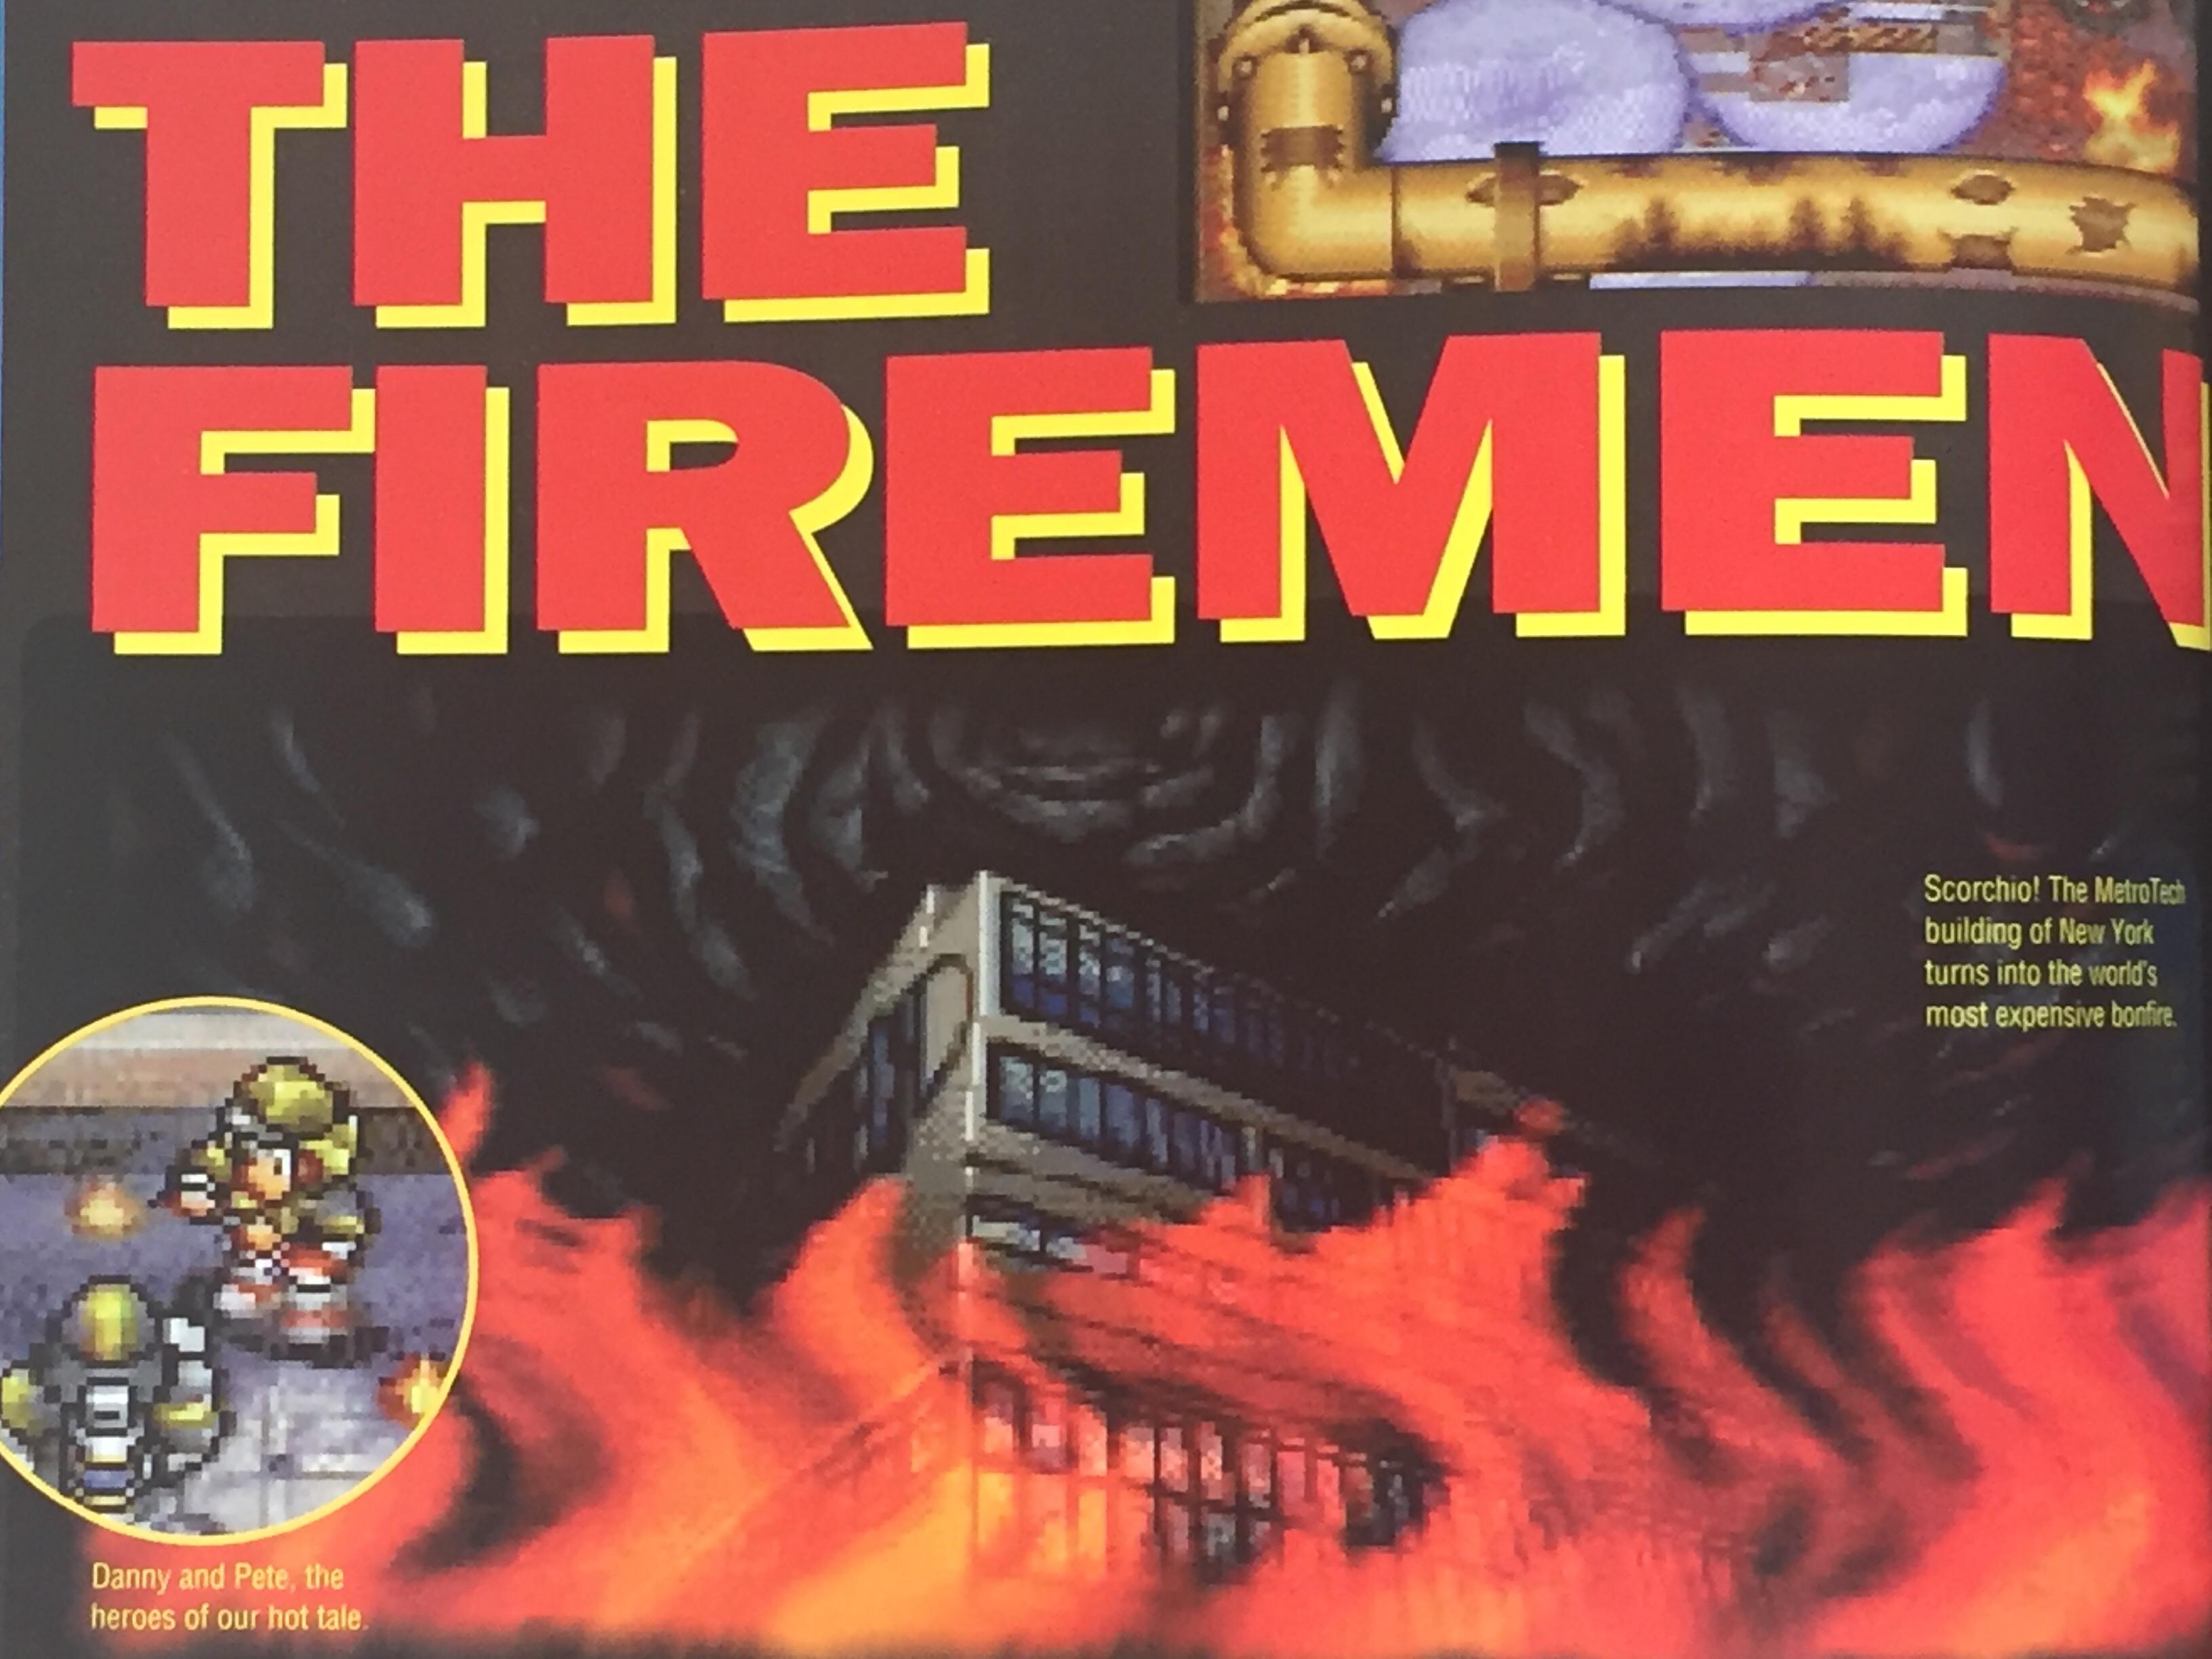 FireMenSP